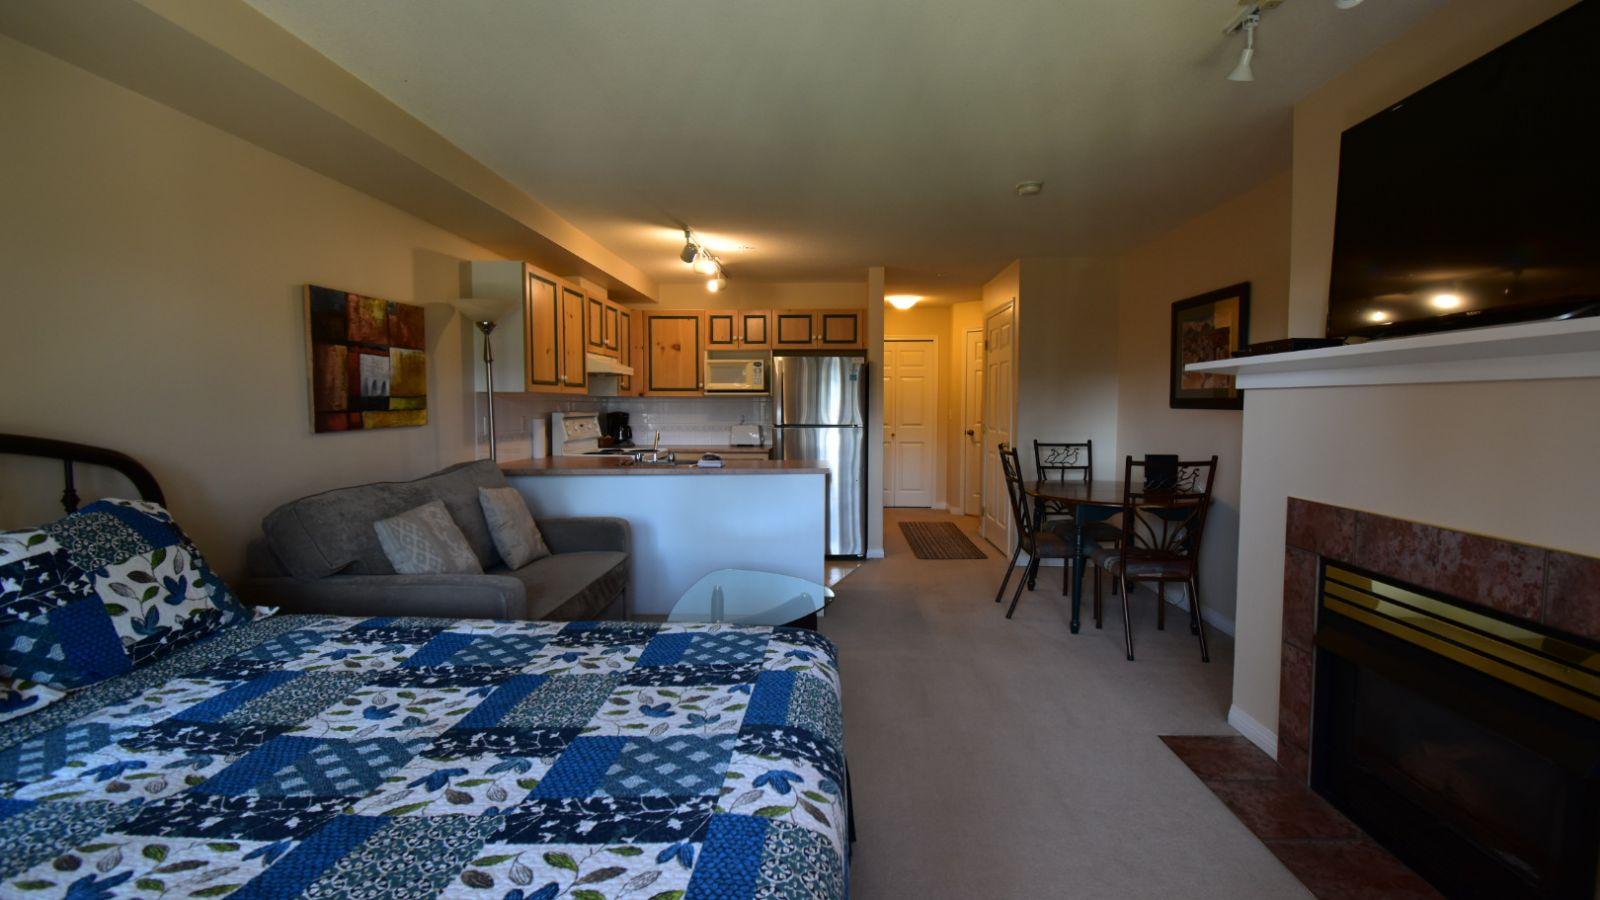 Borgata Lodge - bedding varies from unit to unit